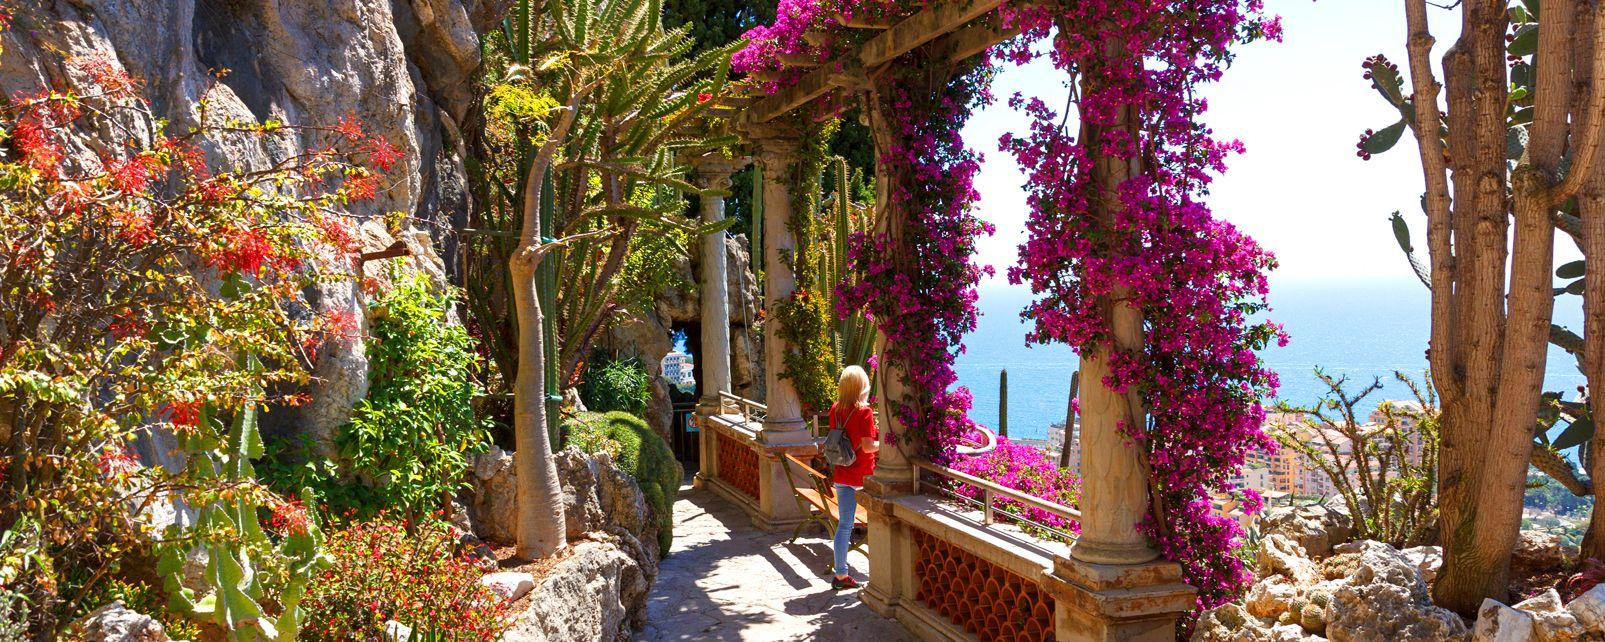 Le Jardin Exotique Monaco